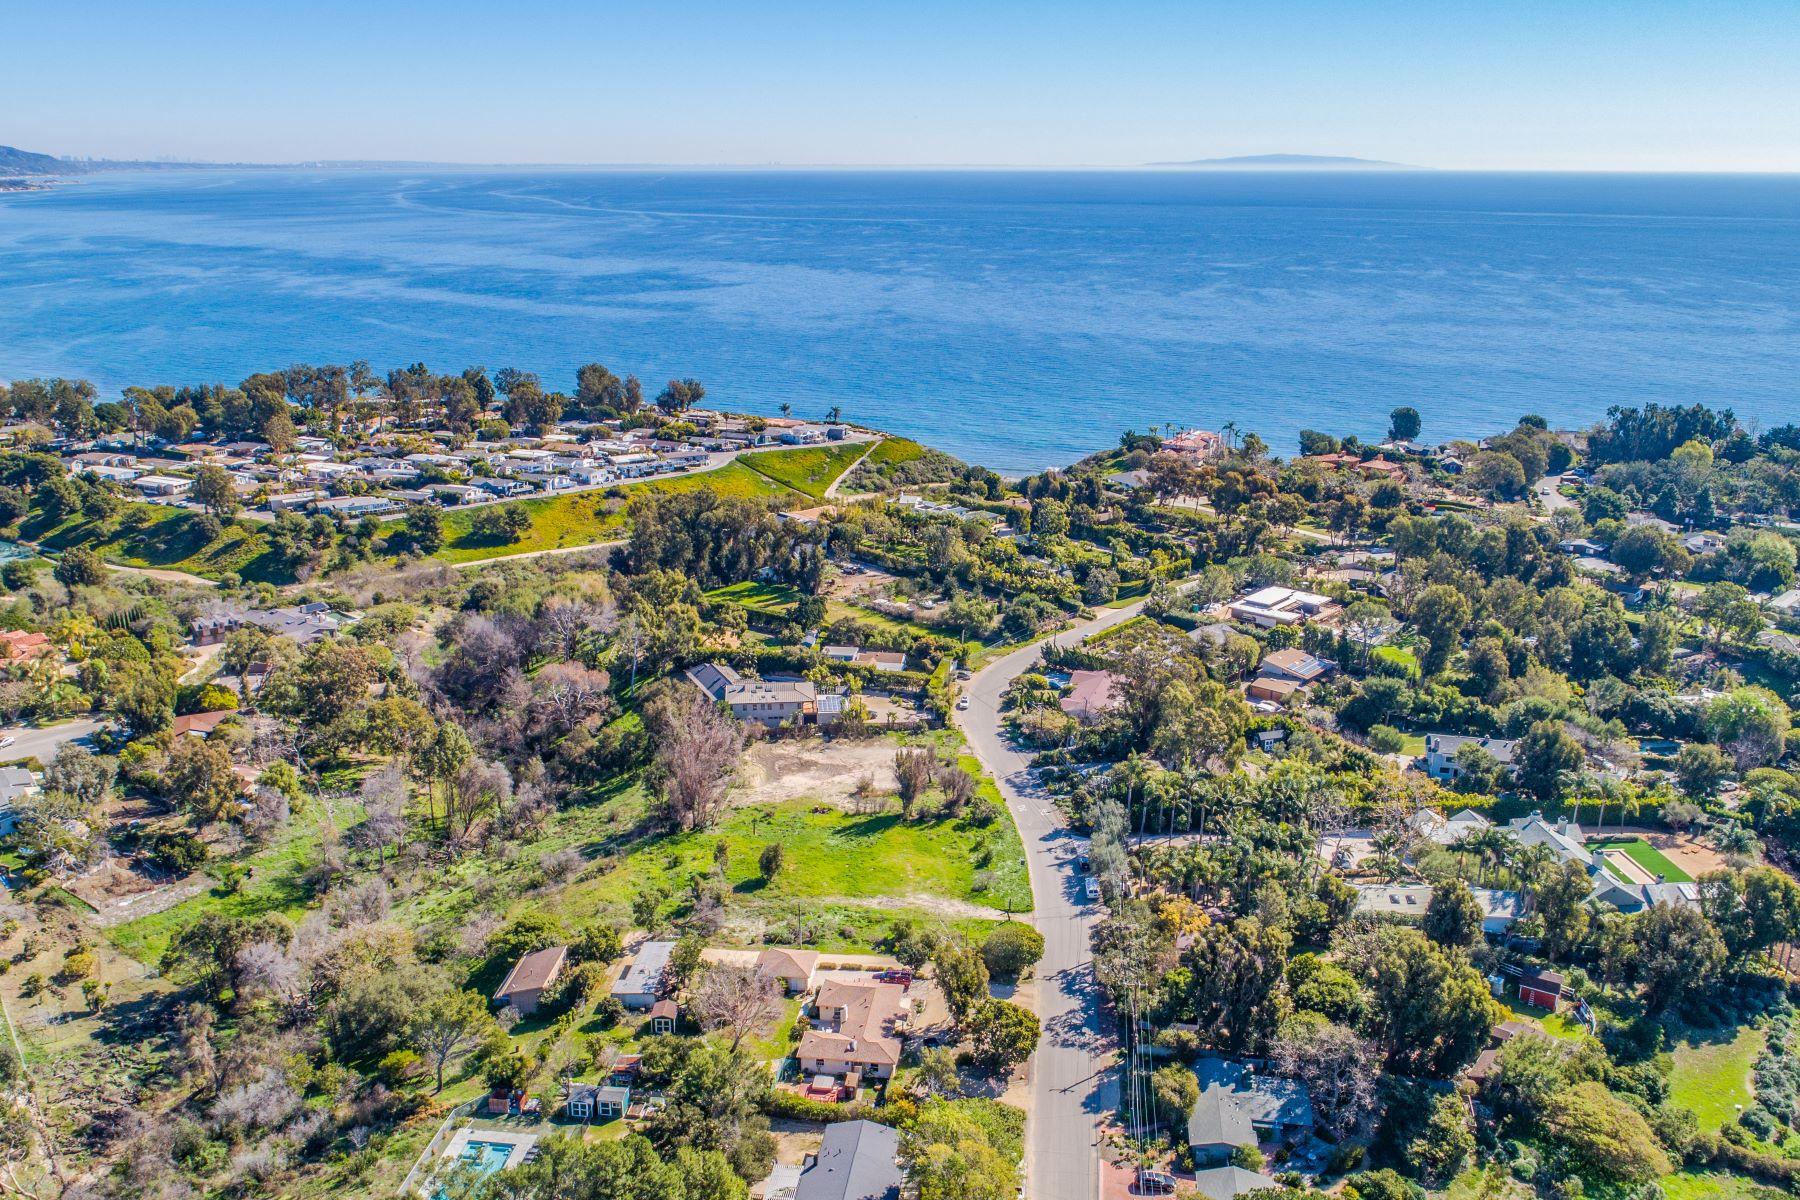 Property for Sale at 6642 Zumirez Drive Malibu, California 90265 United States